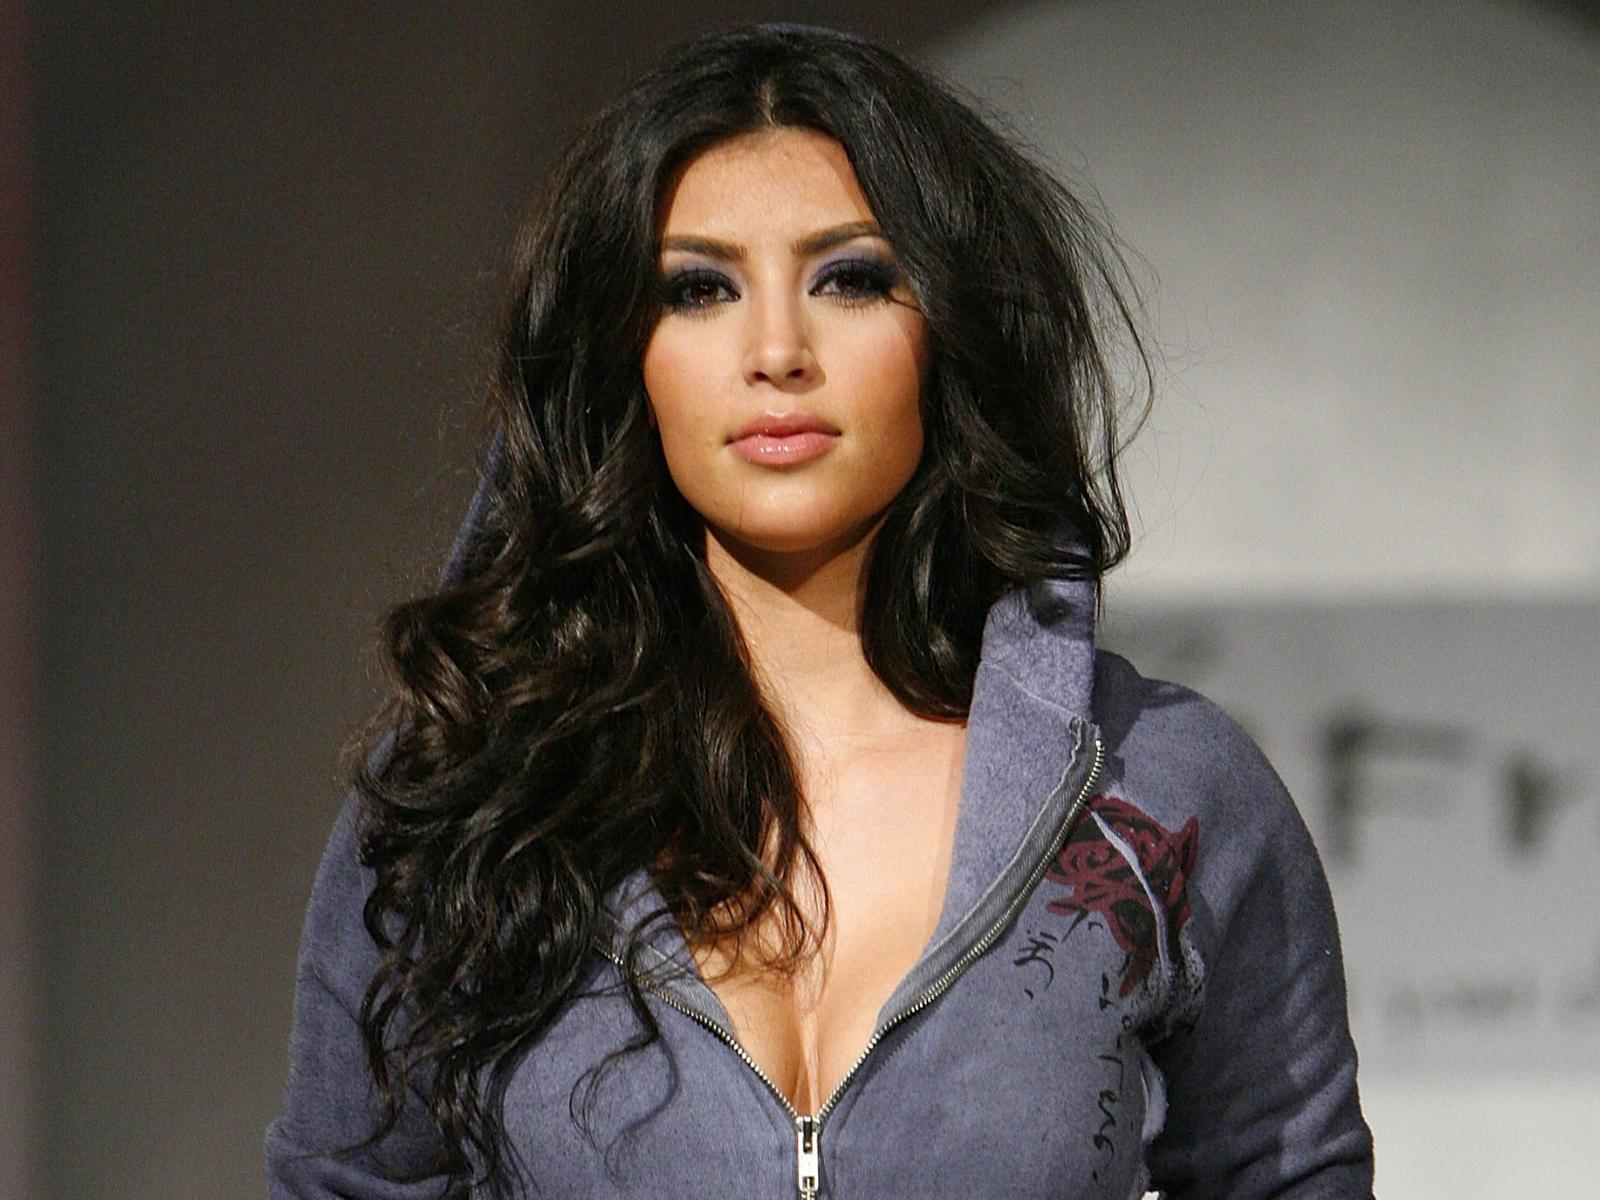 http://3.bp.blogspot.com/-cP0gRByQw0A/UA3S4NDd5AI/AAAAAAAA8jU/yabmiRjkWz0/s1600/kim-kardashian.jpg